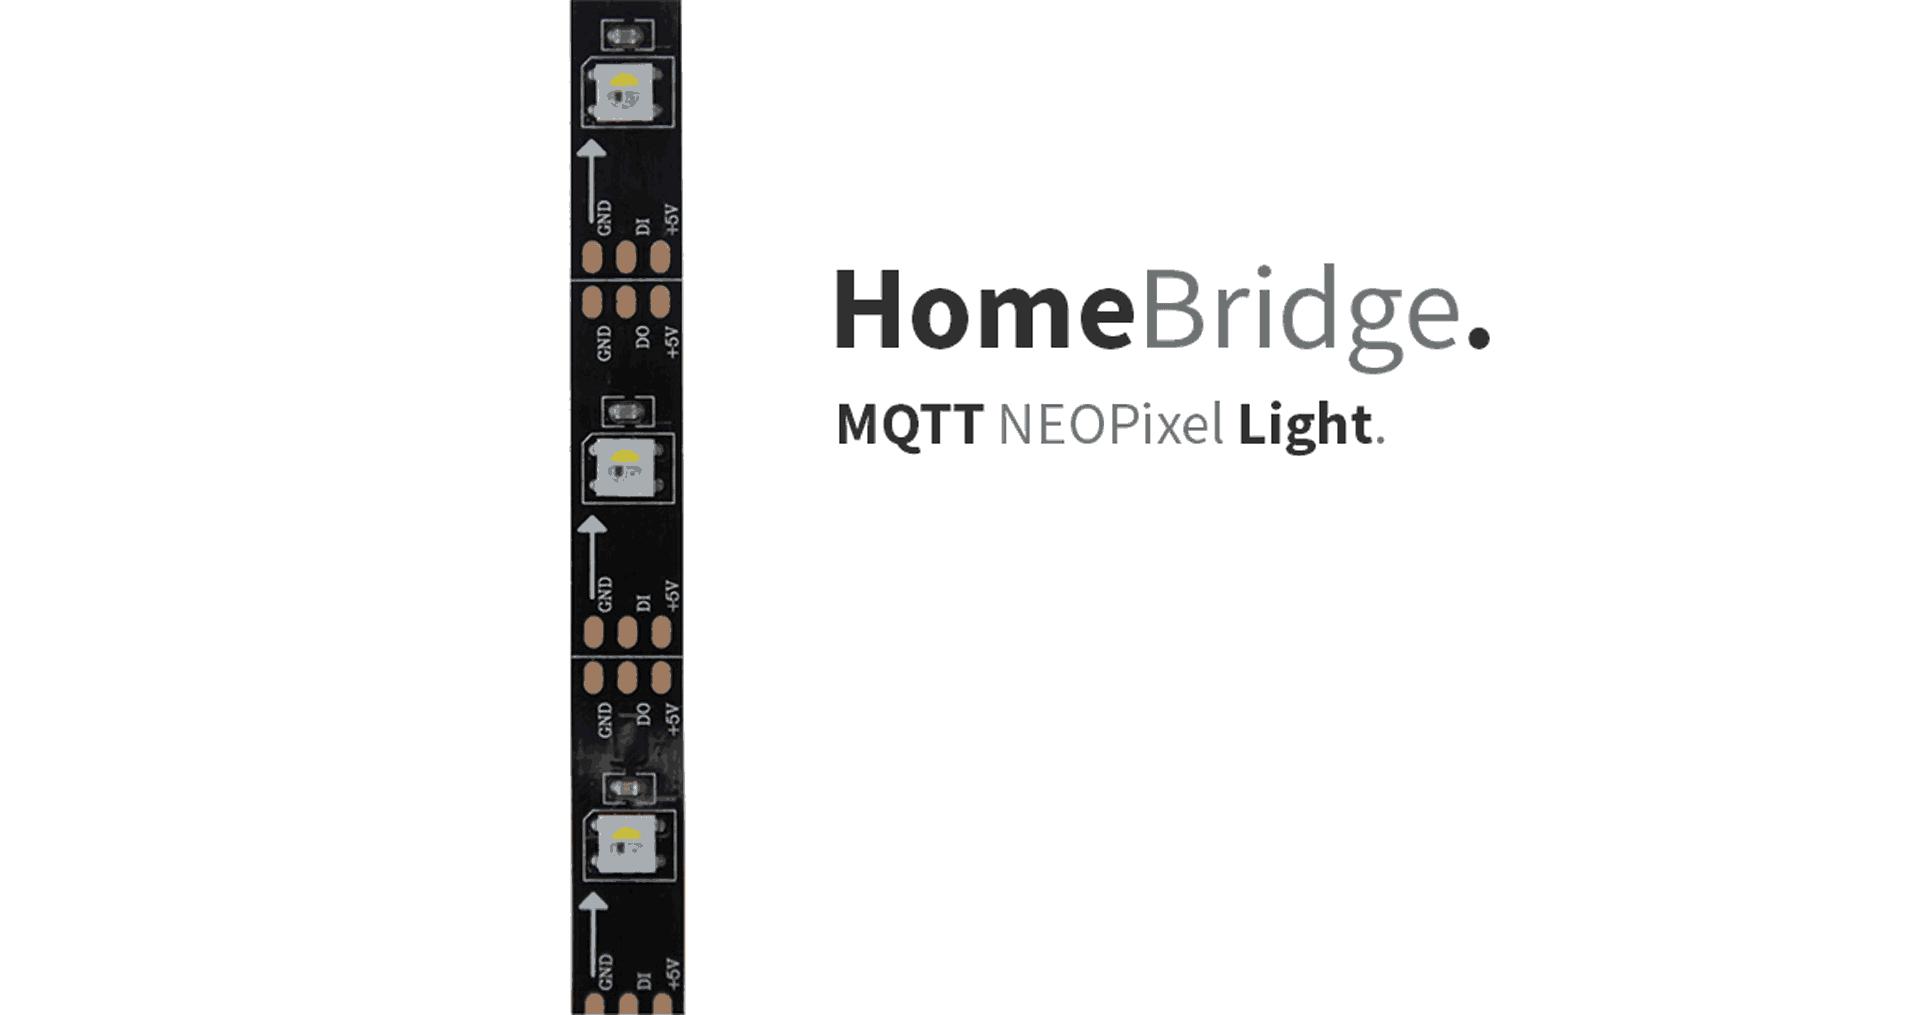 HomeBridge – MQTT NeoPixel